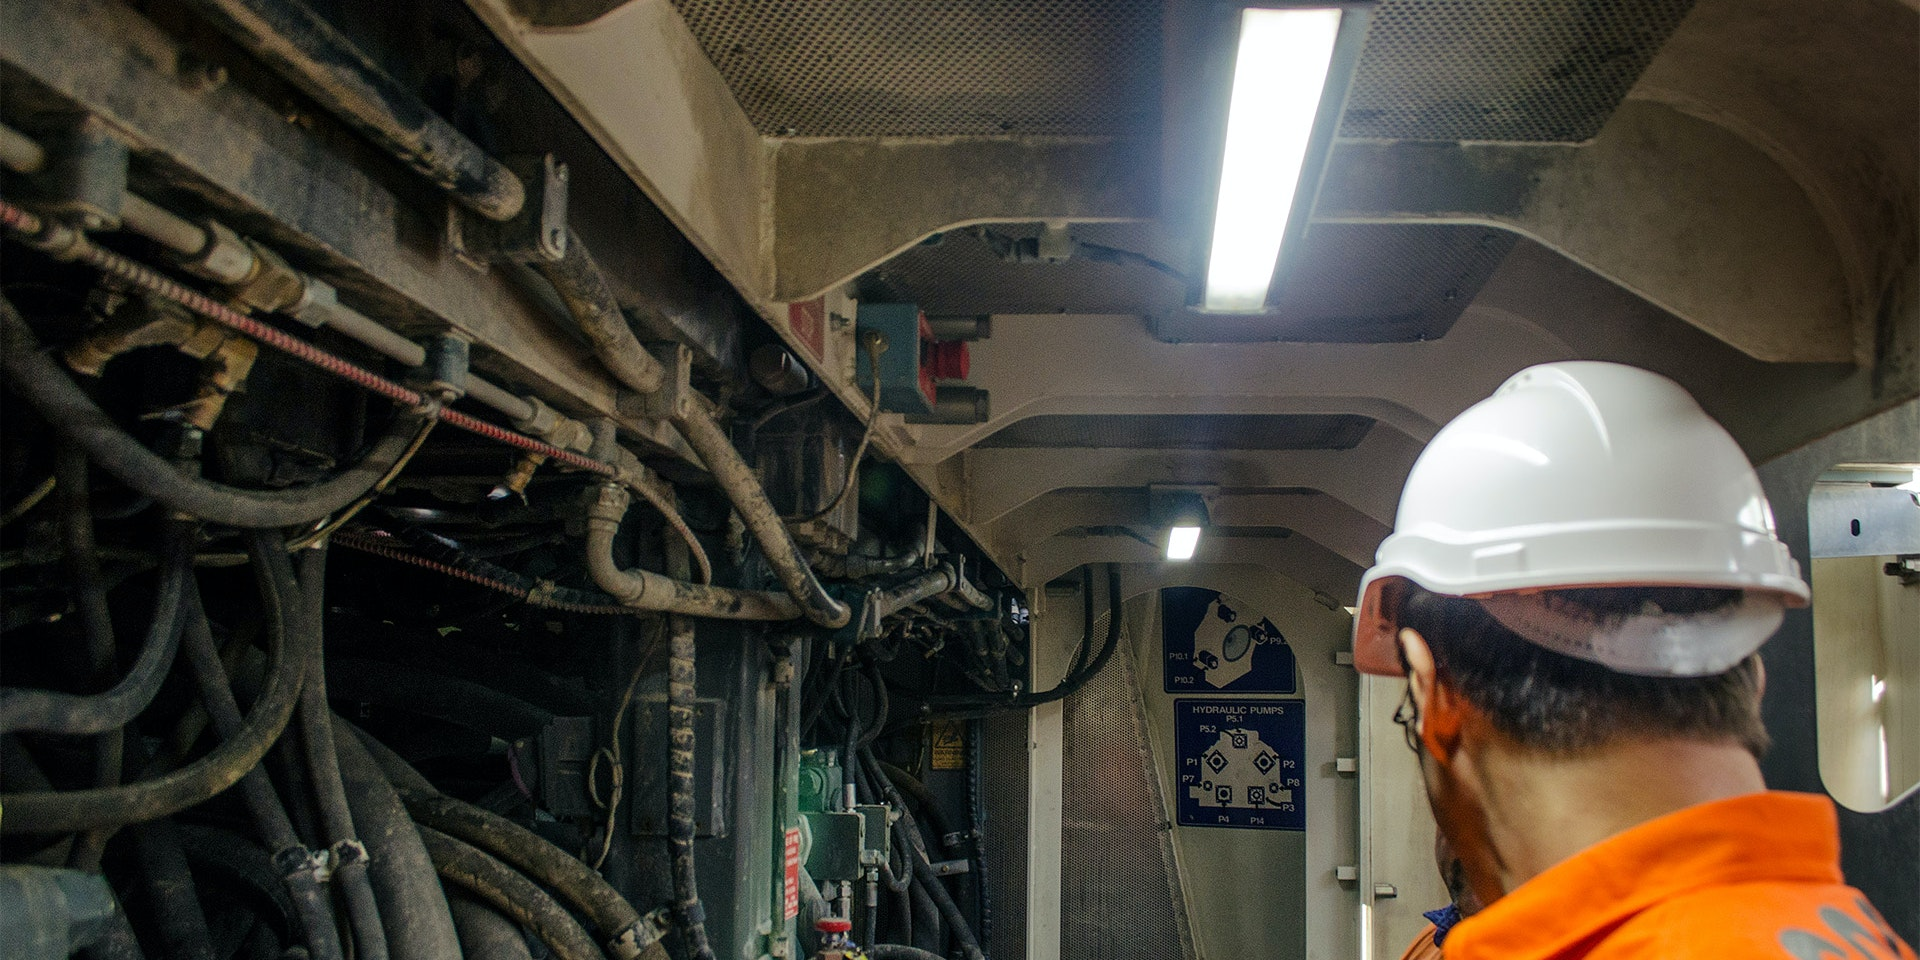 MC22 Machine Light in application, installed in the engine bay on a 996 liebherr excavator